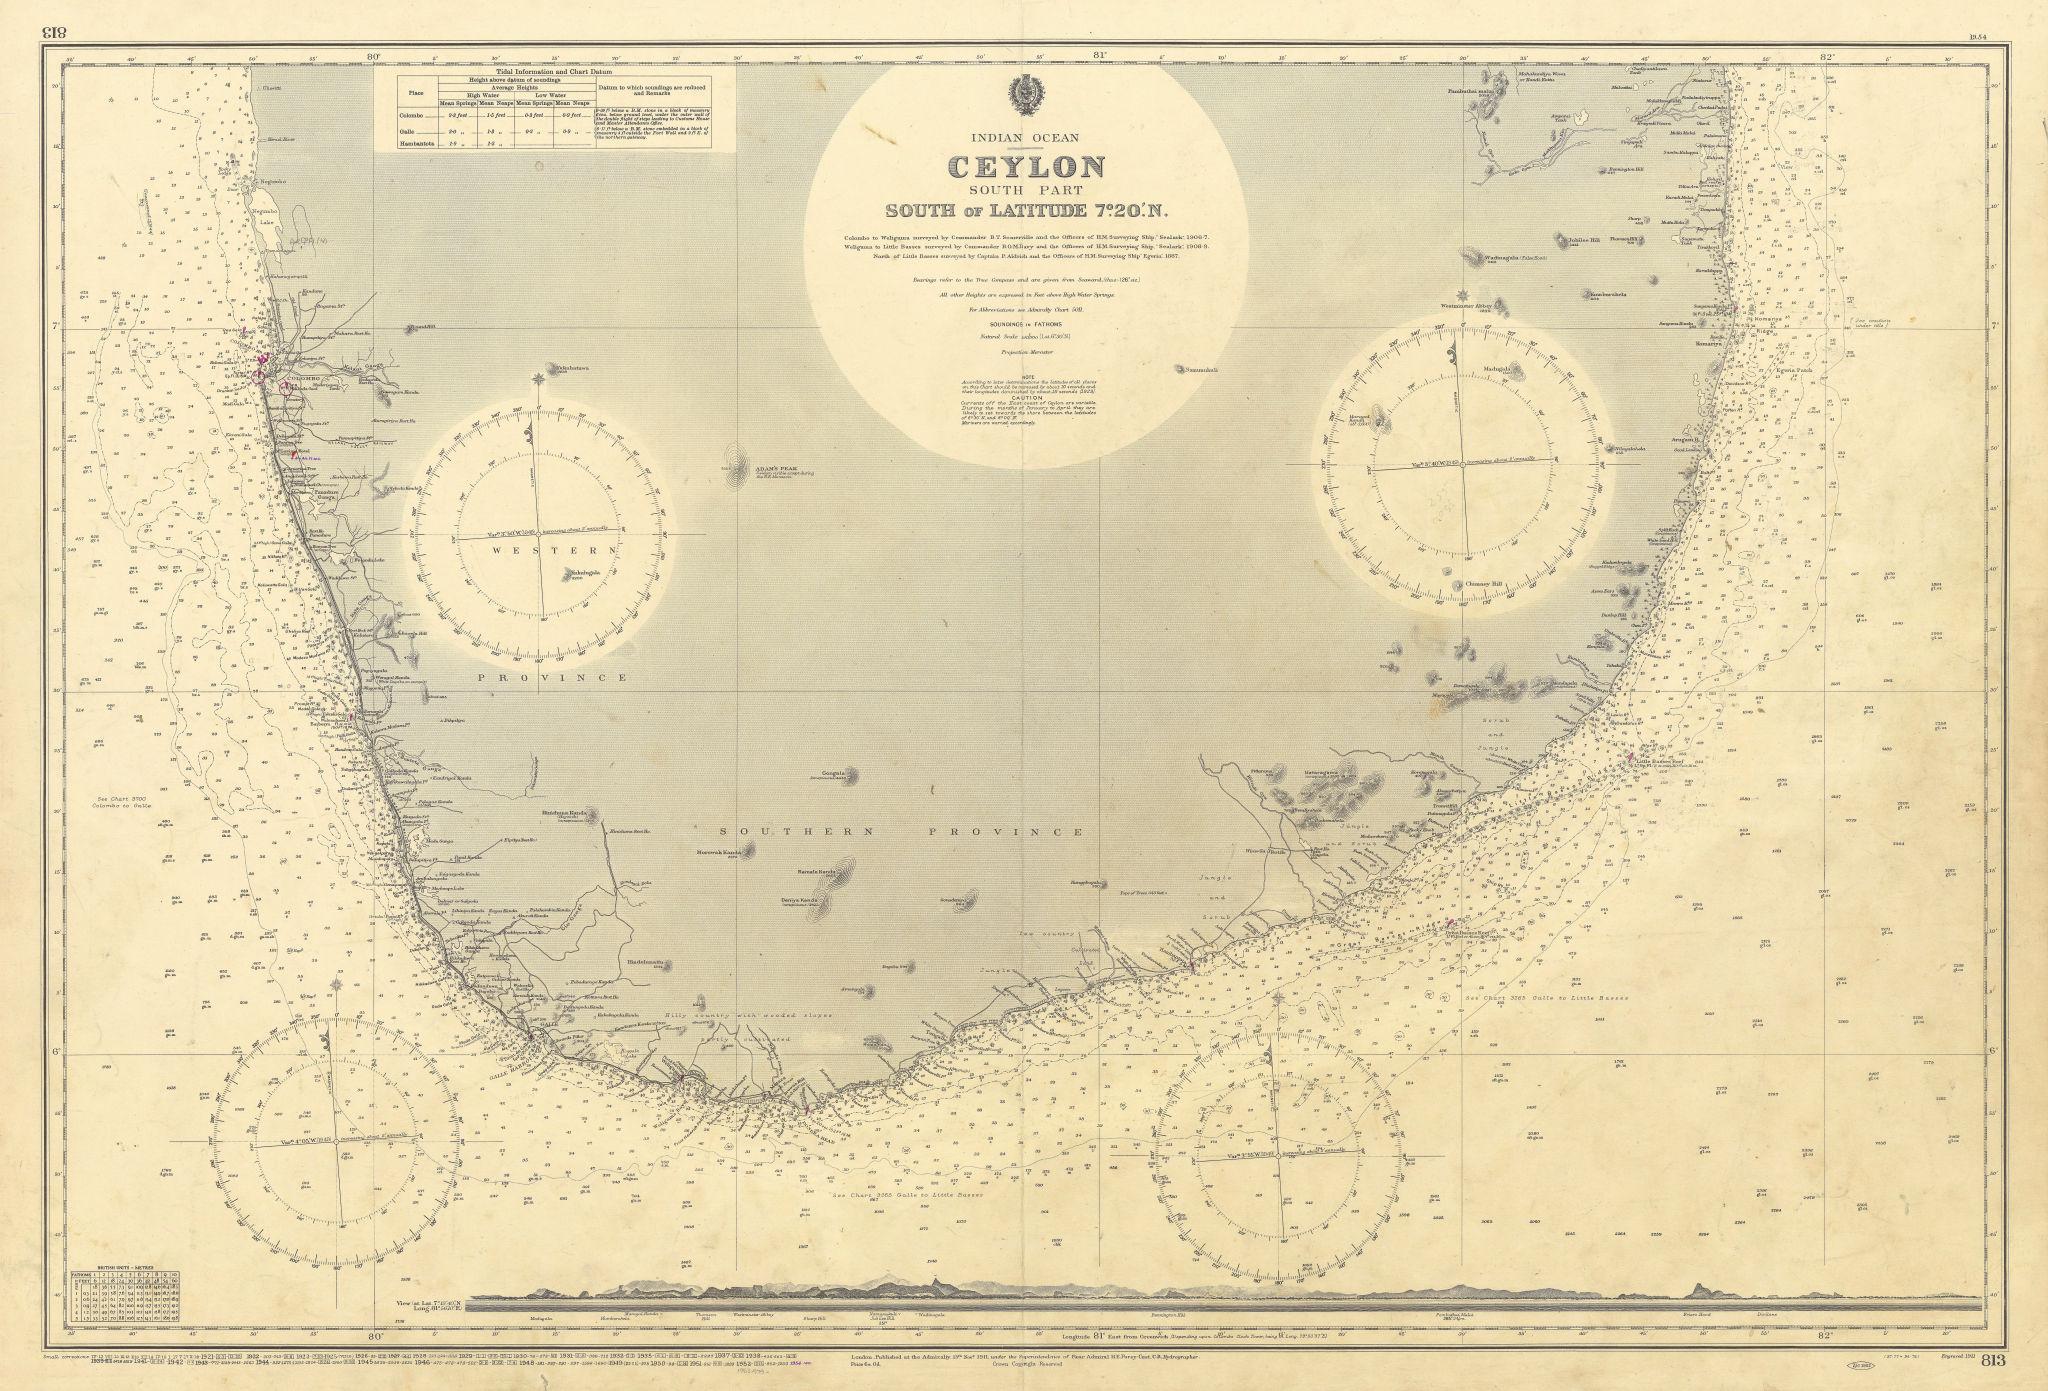 Ceylon South of Latitude 7°20'N. Sri Lanka. ADMIRALTY sea chart 1911 (1954) map